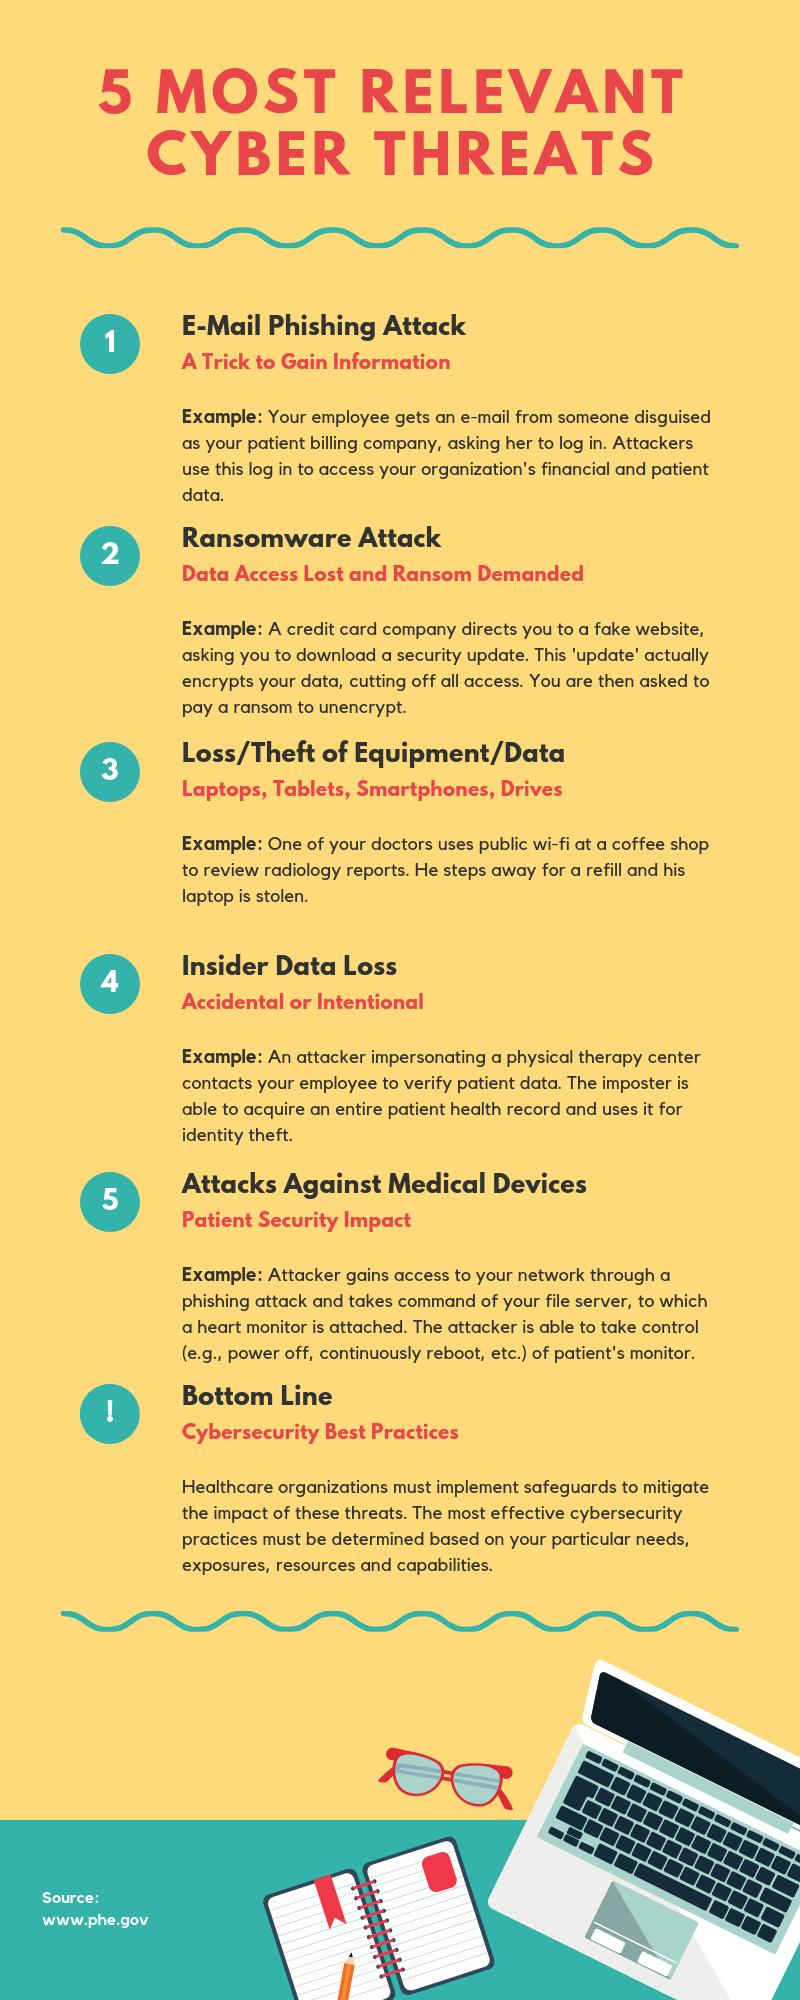 Top 5 Cyber Threats